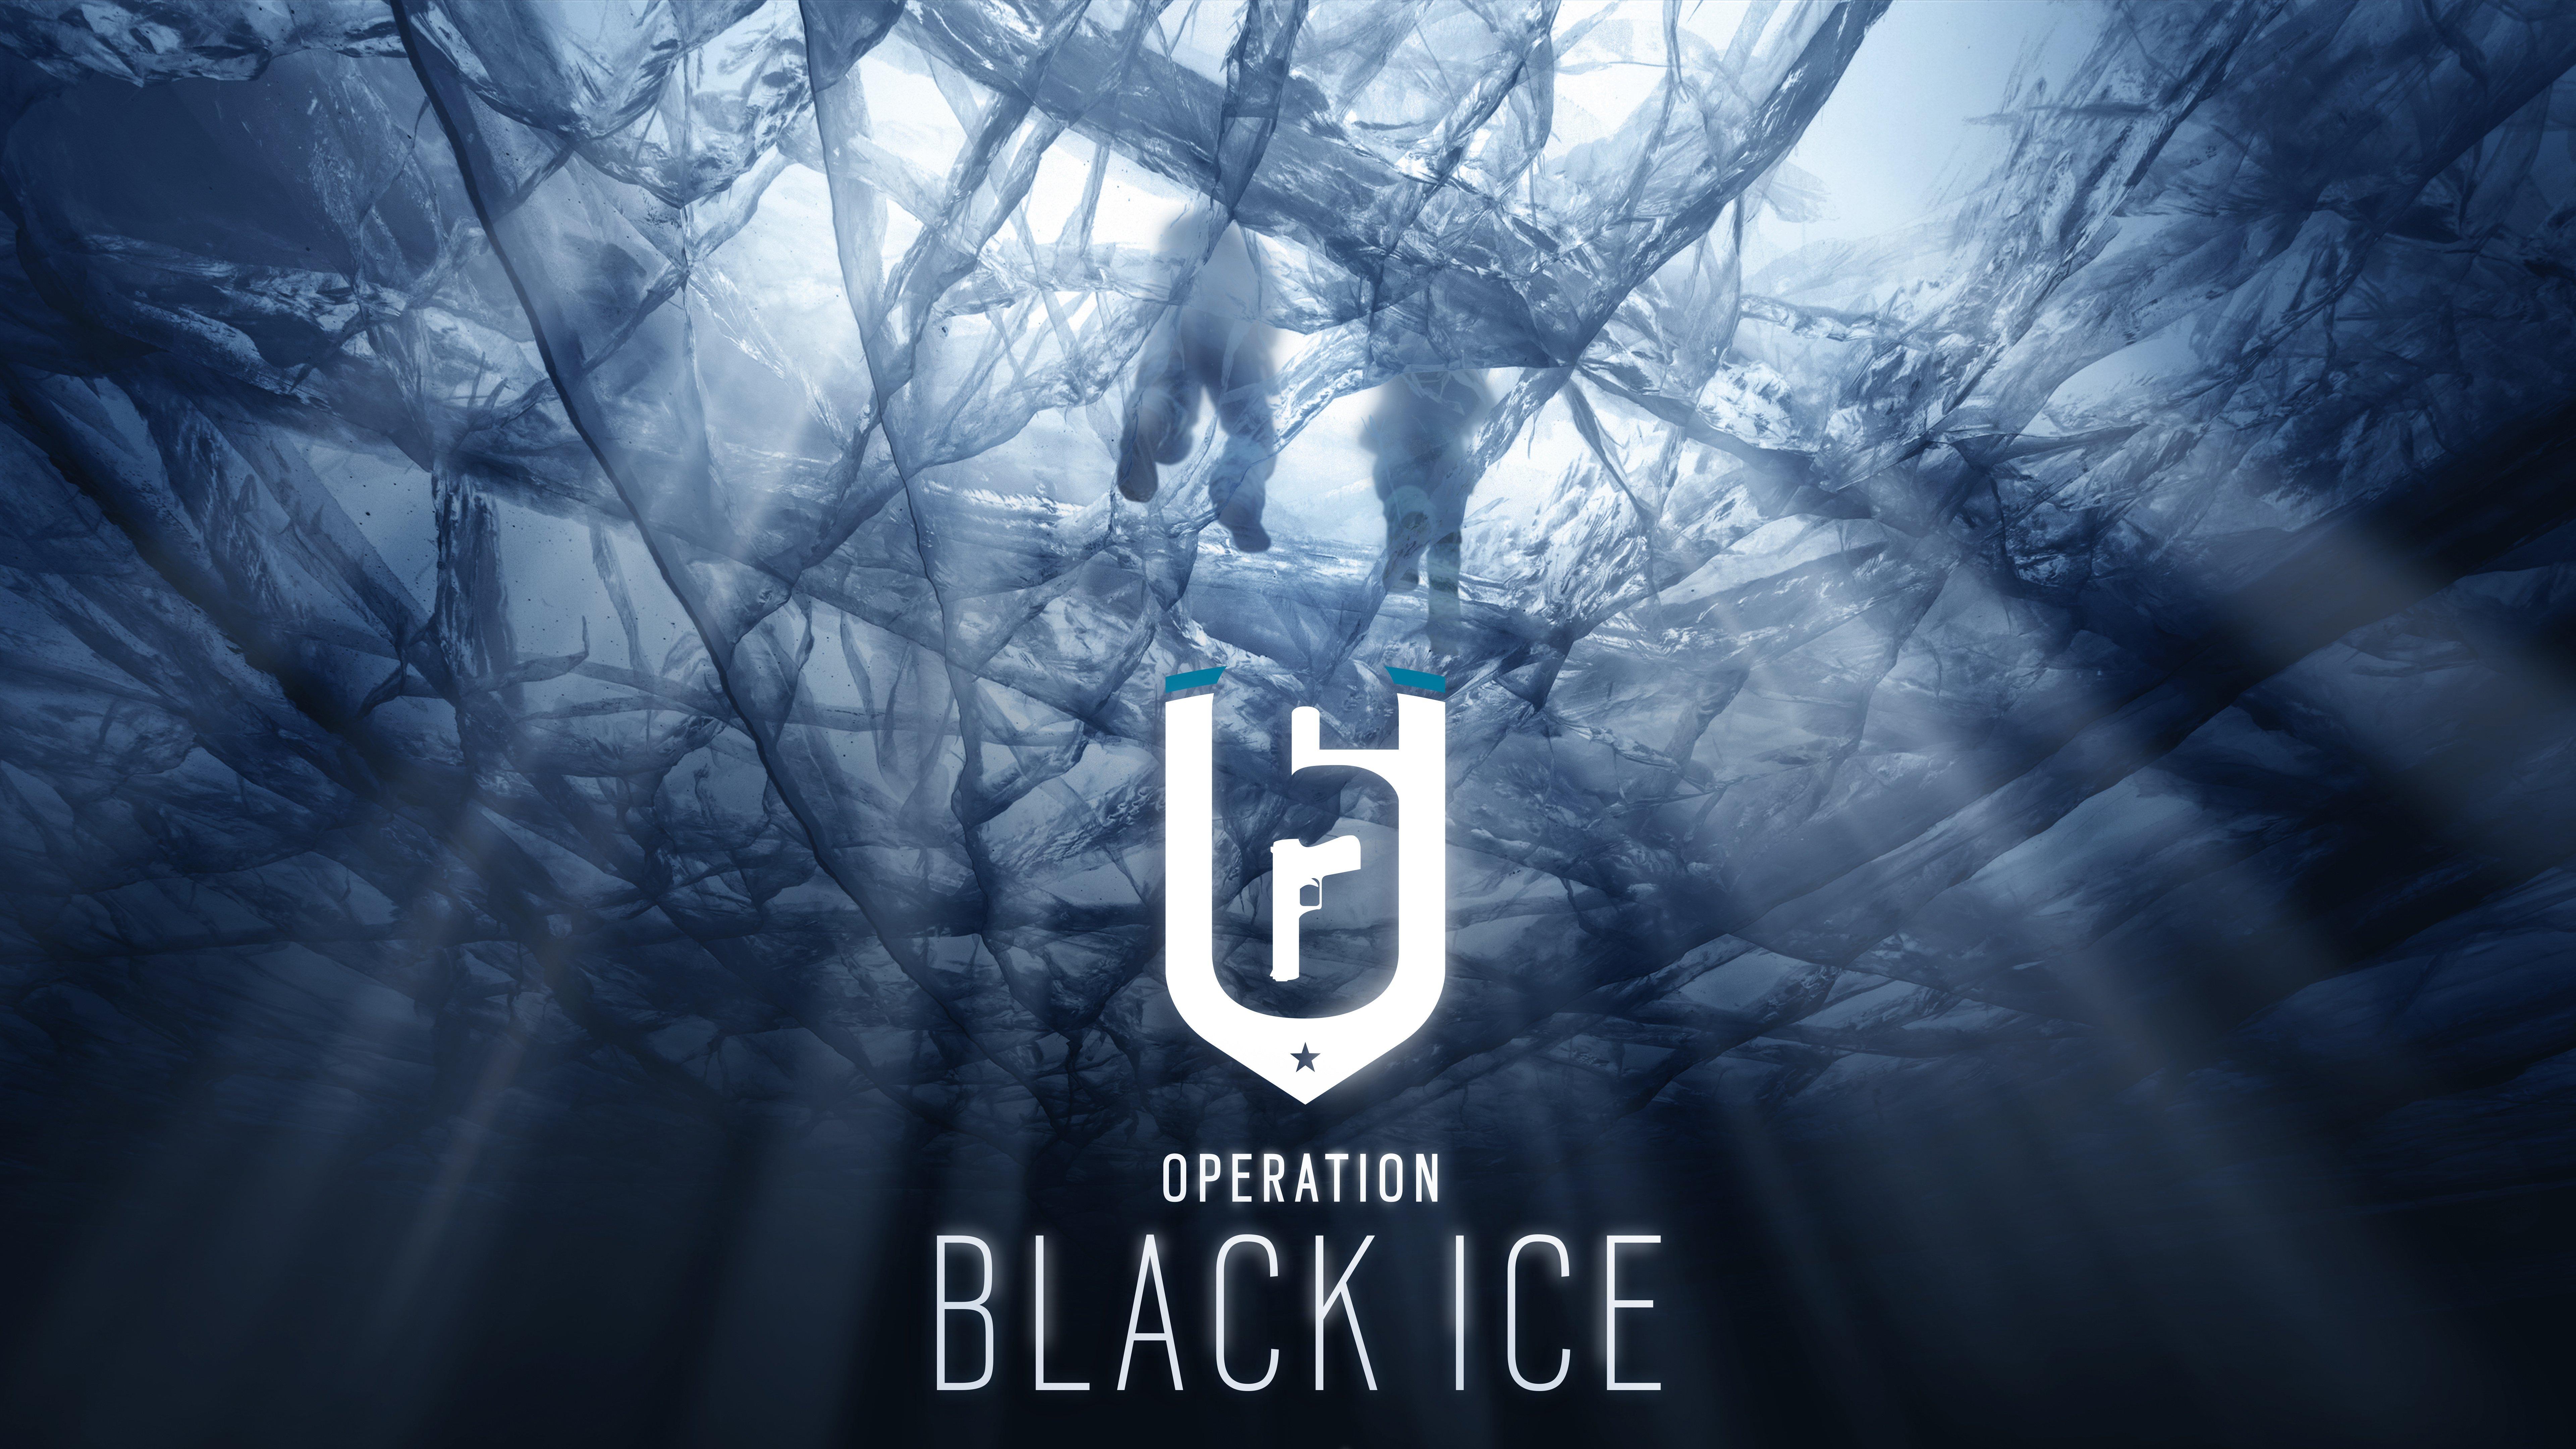 7680x4320 Rainbow Six Siege Opeation Black Ice 8k Hd 4k Wallpapers